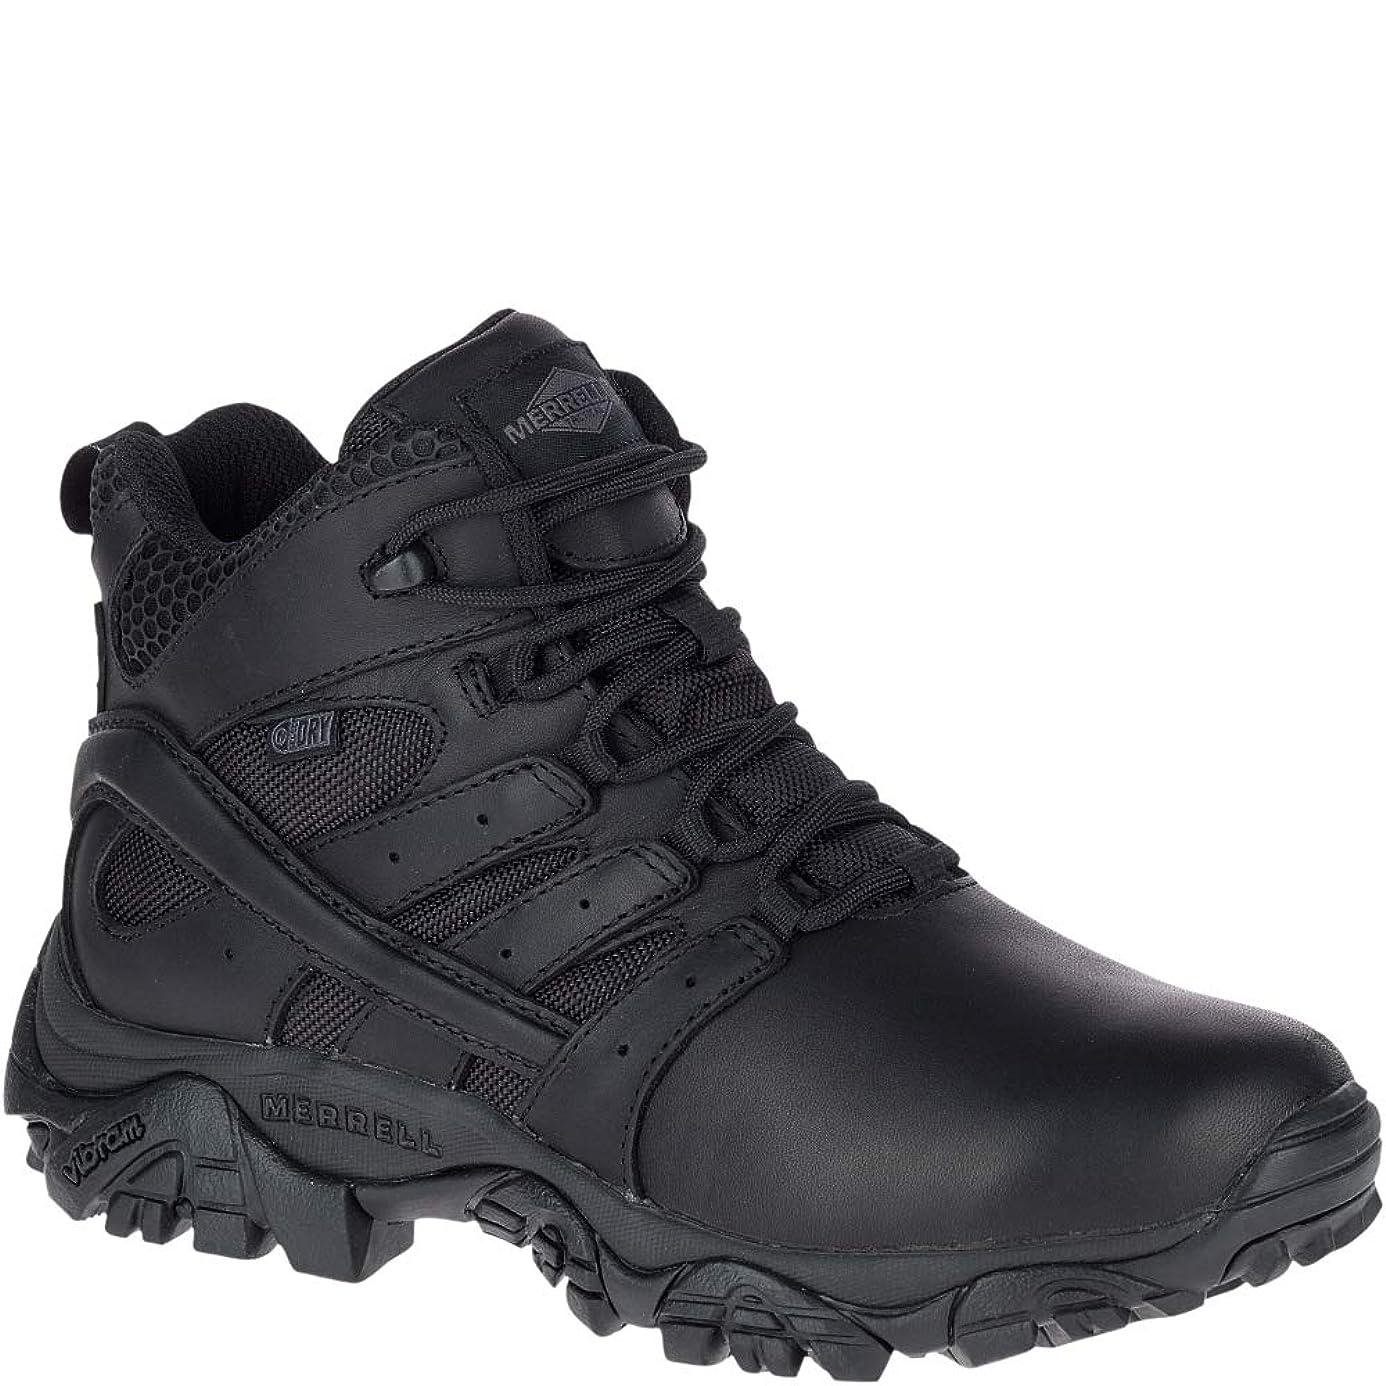 Merrell Moab 2 Mid Tactical Response Waterproof Boot Women's